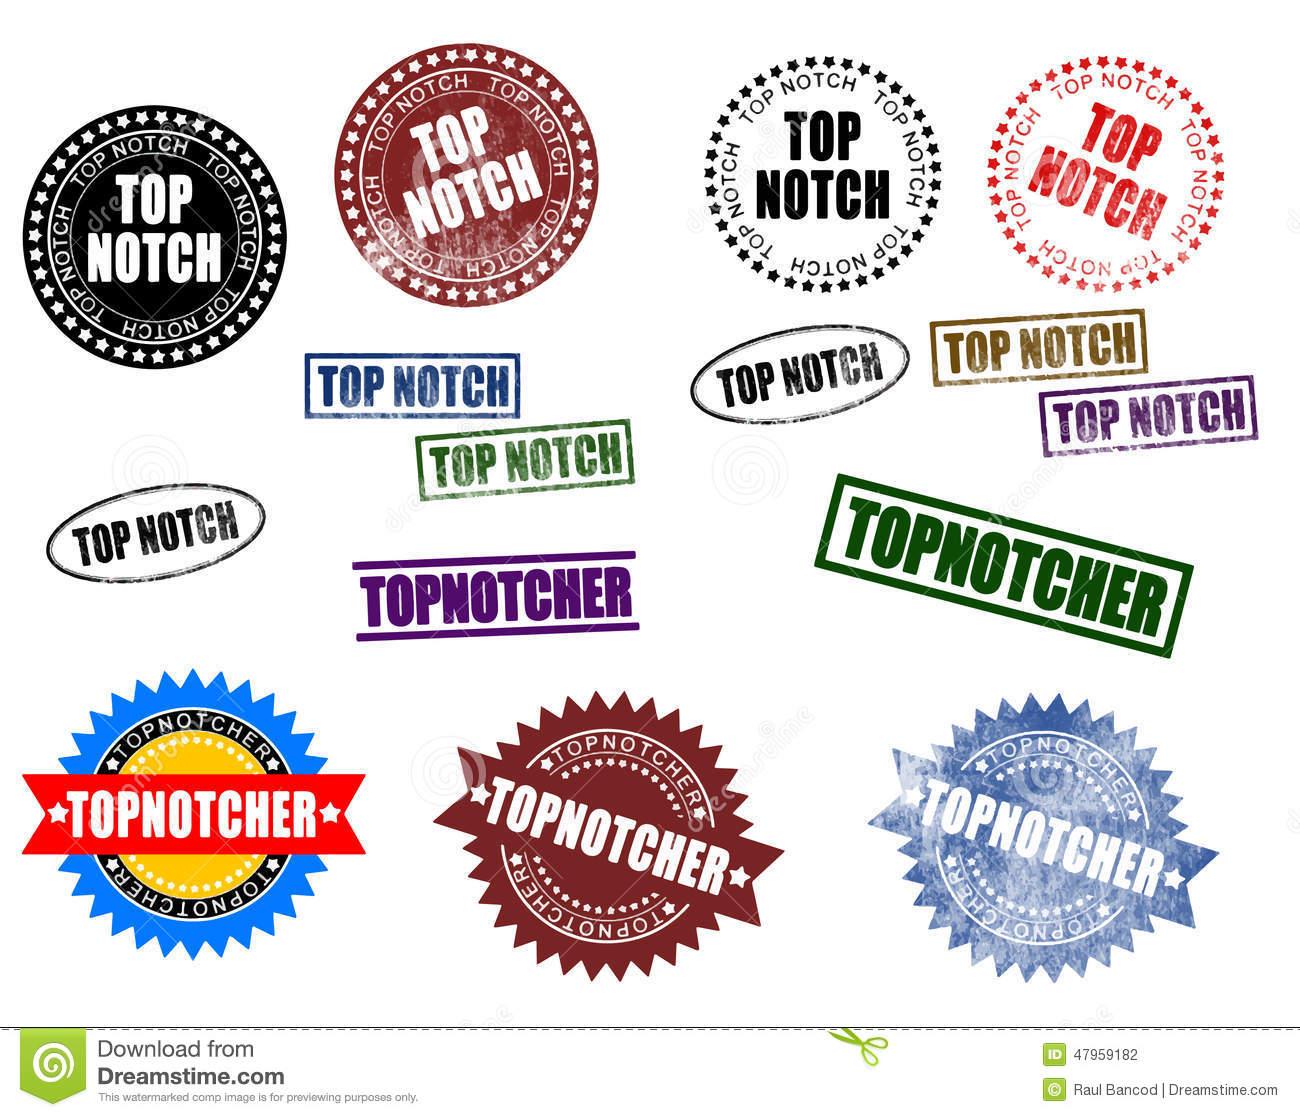 Top Notch Topnotcher (Vector) Stock Vector.